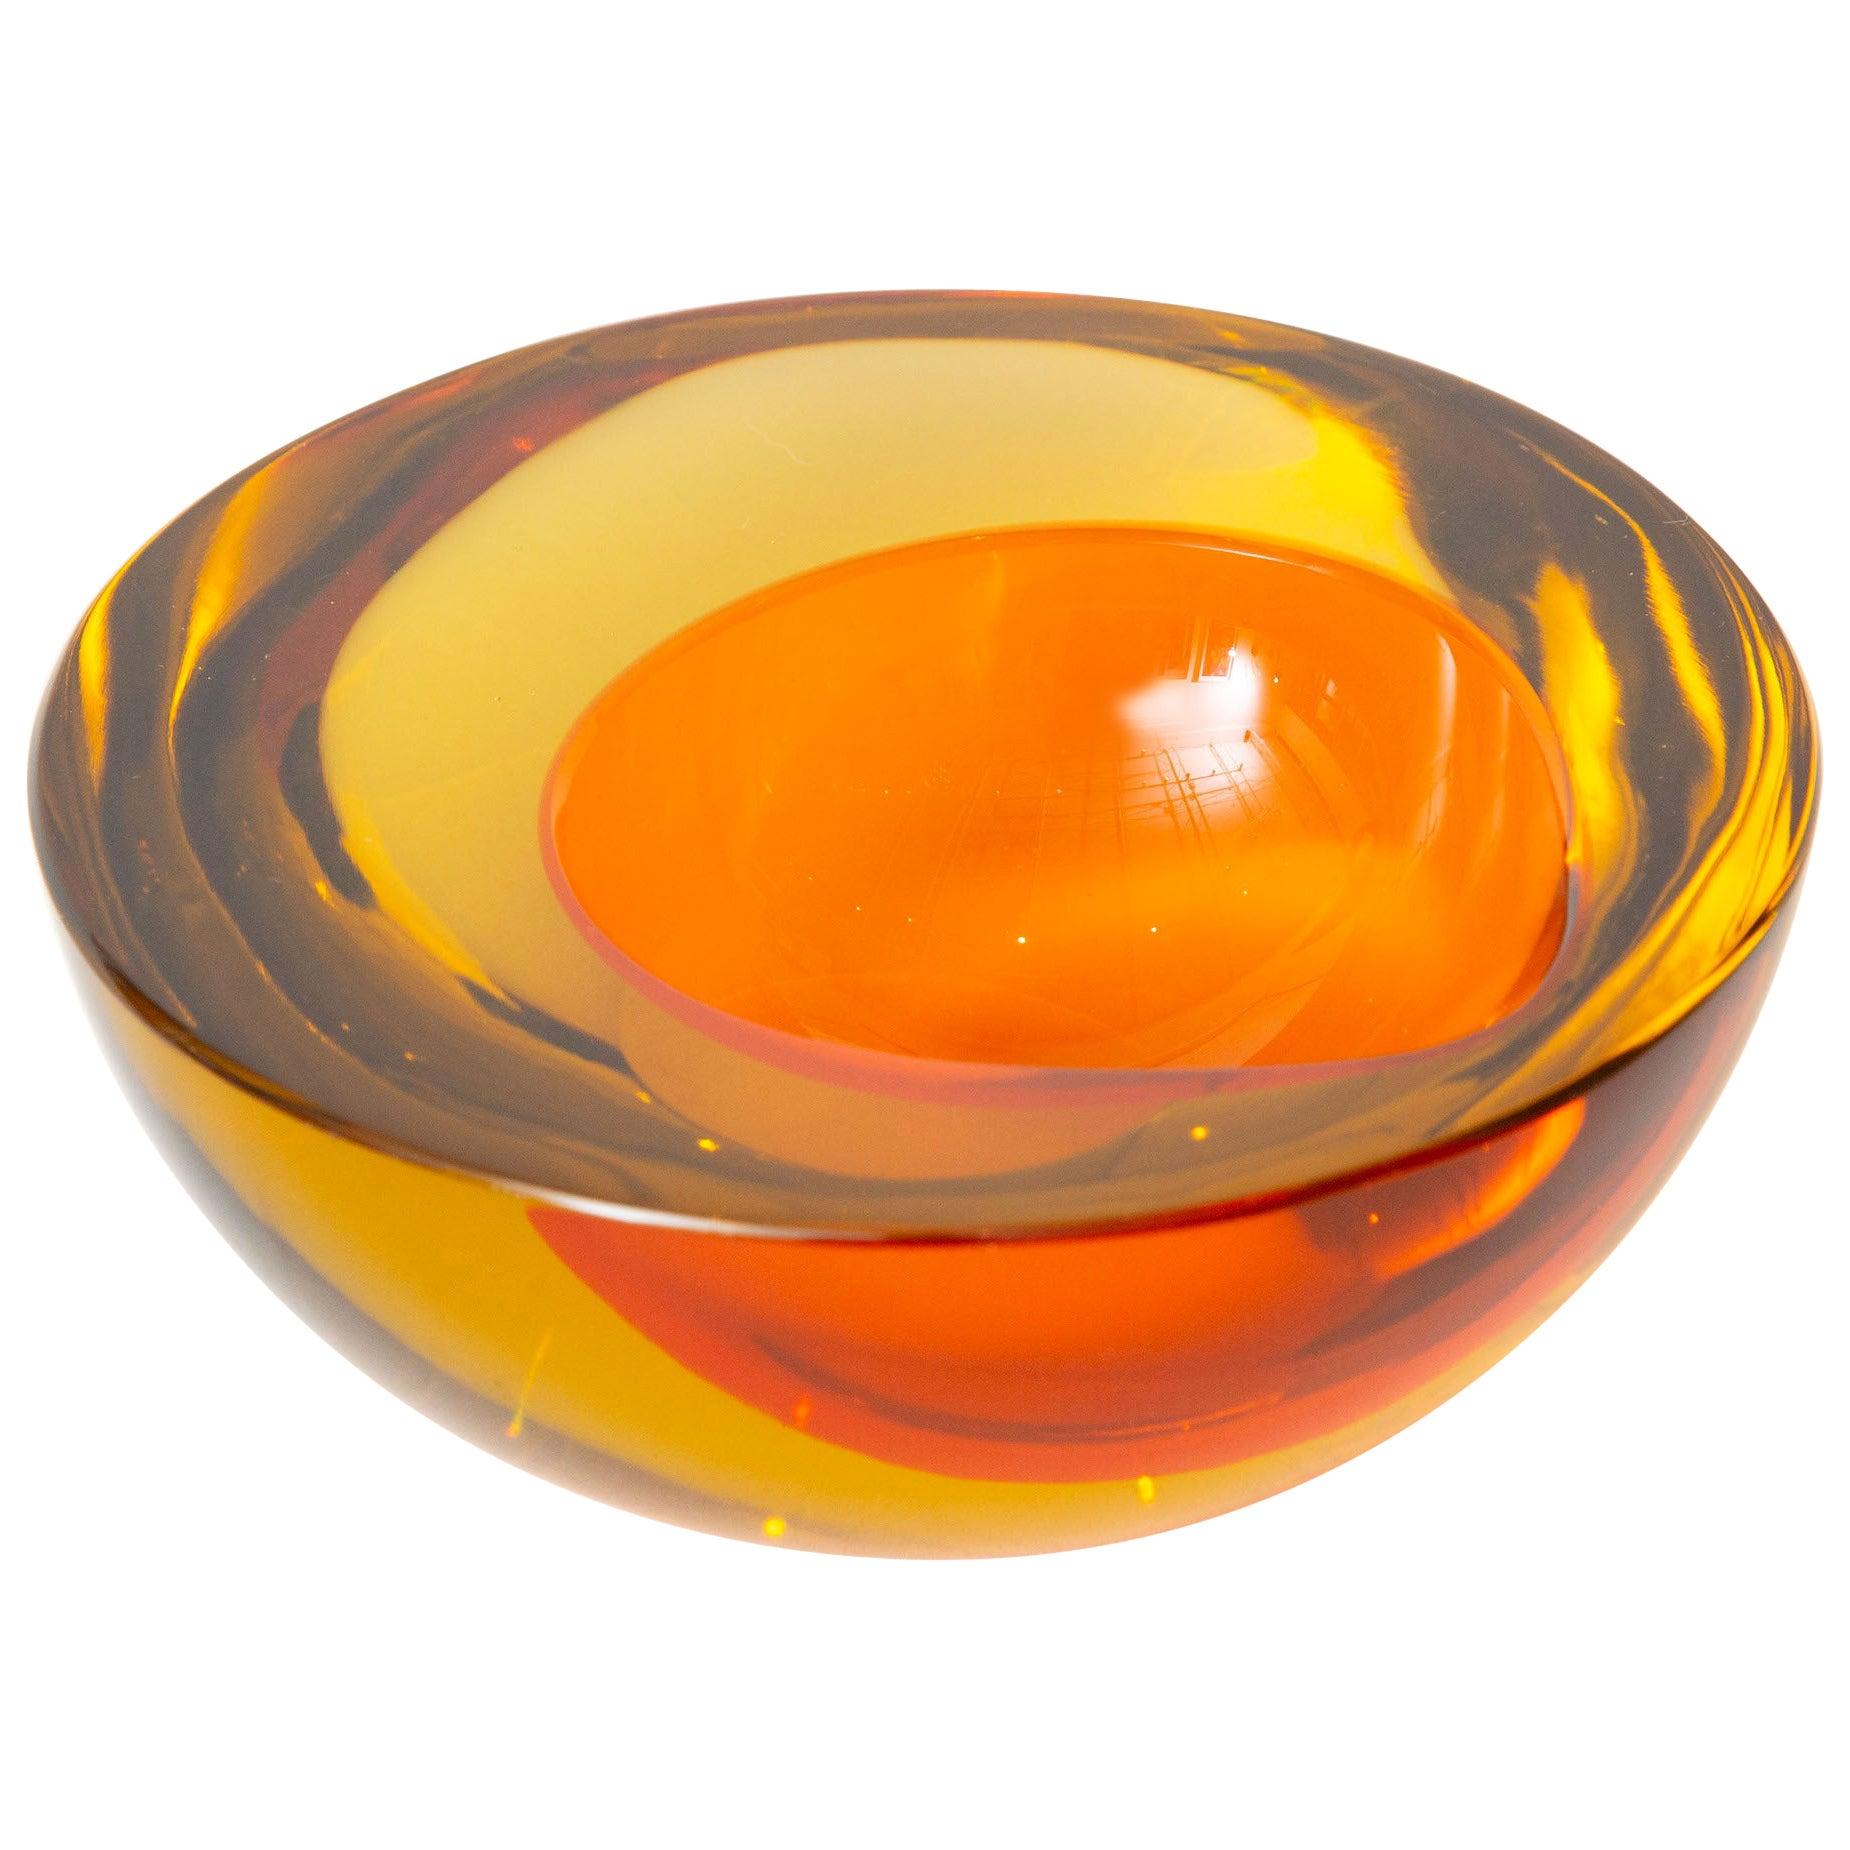 Murano Mandruzzato Orange and Amber Yellow Sommerso Geode Glass Bowl Vintage